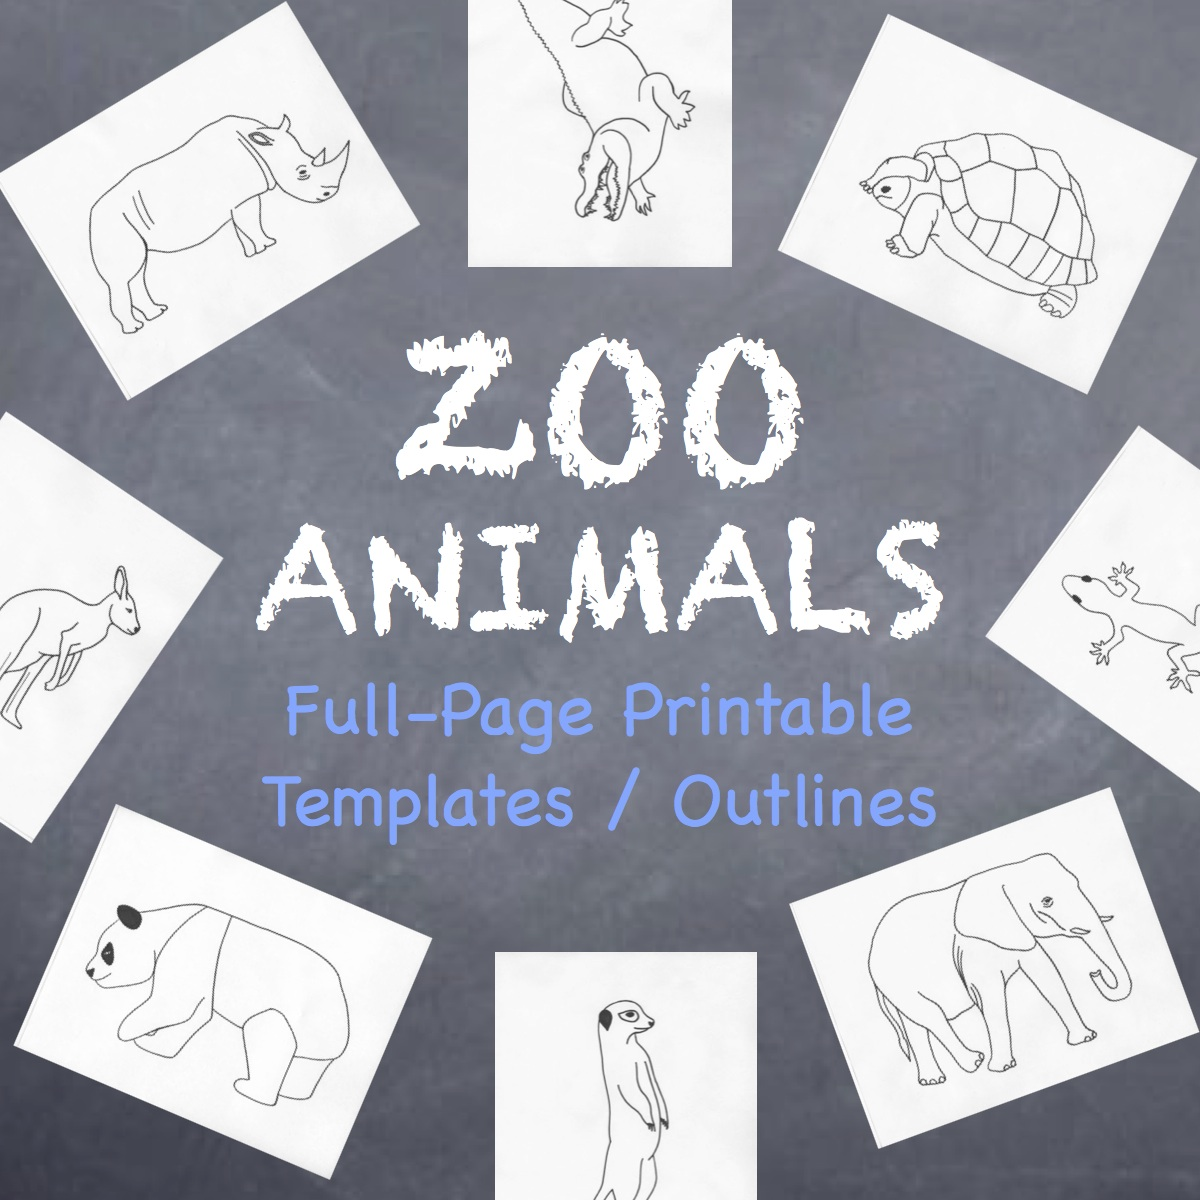 Zoo Animals (c) Kristen Dembroski